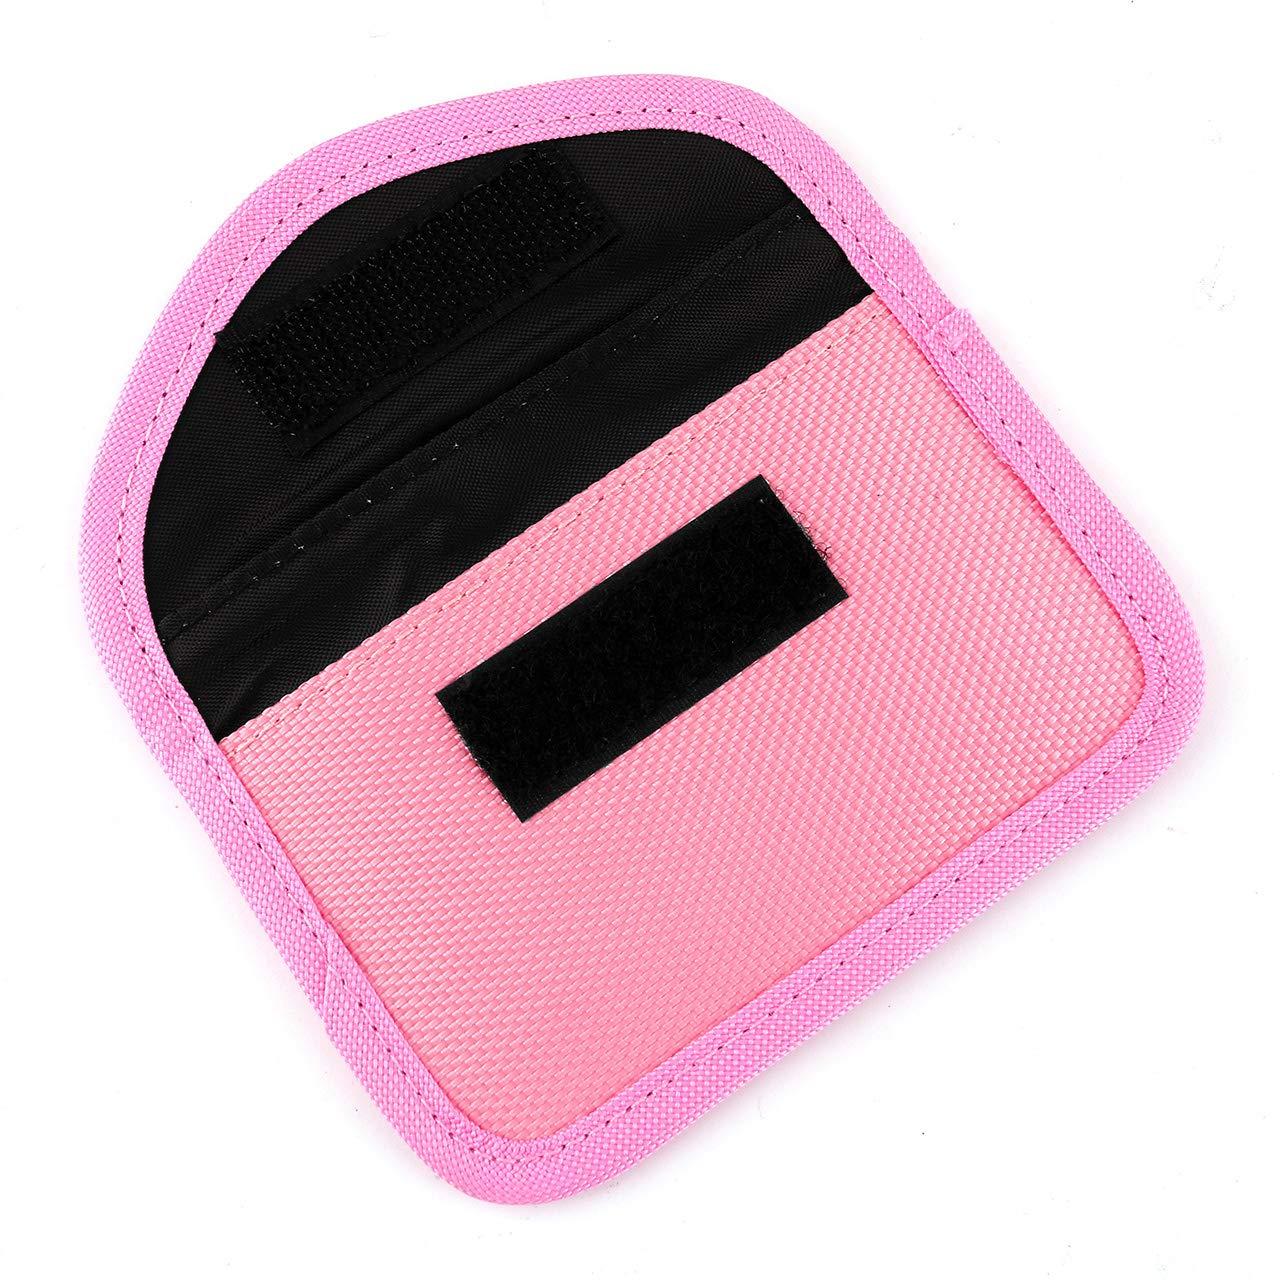 ACBungji Faraday Bag Schutz Blocker Keyless Go Autoschl/üssel Tasche NFC Schutzh/ülle Kreditkarte RFID Smartcard 8 * 12cm, Oxford-Tuch Horizontal Schwarz